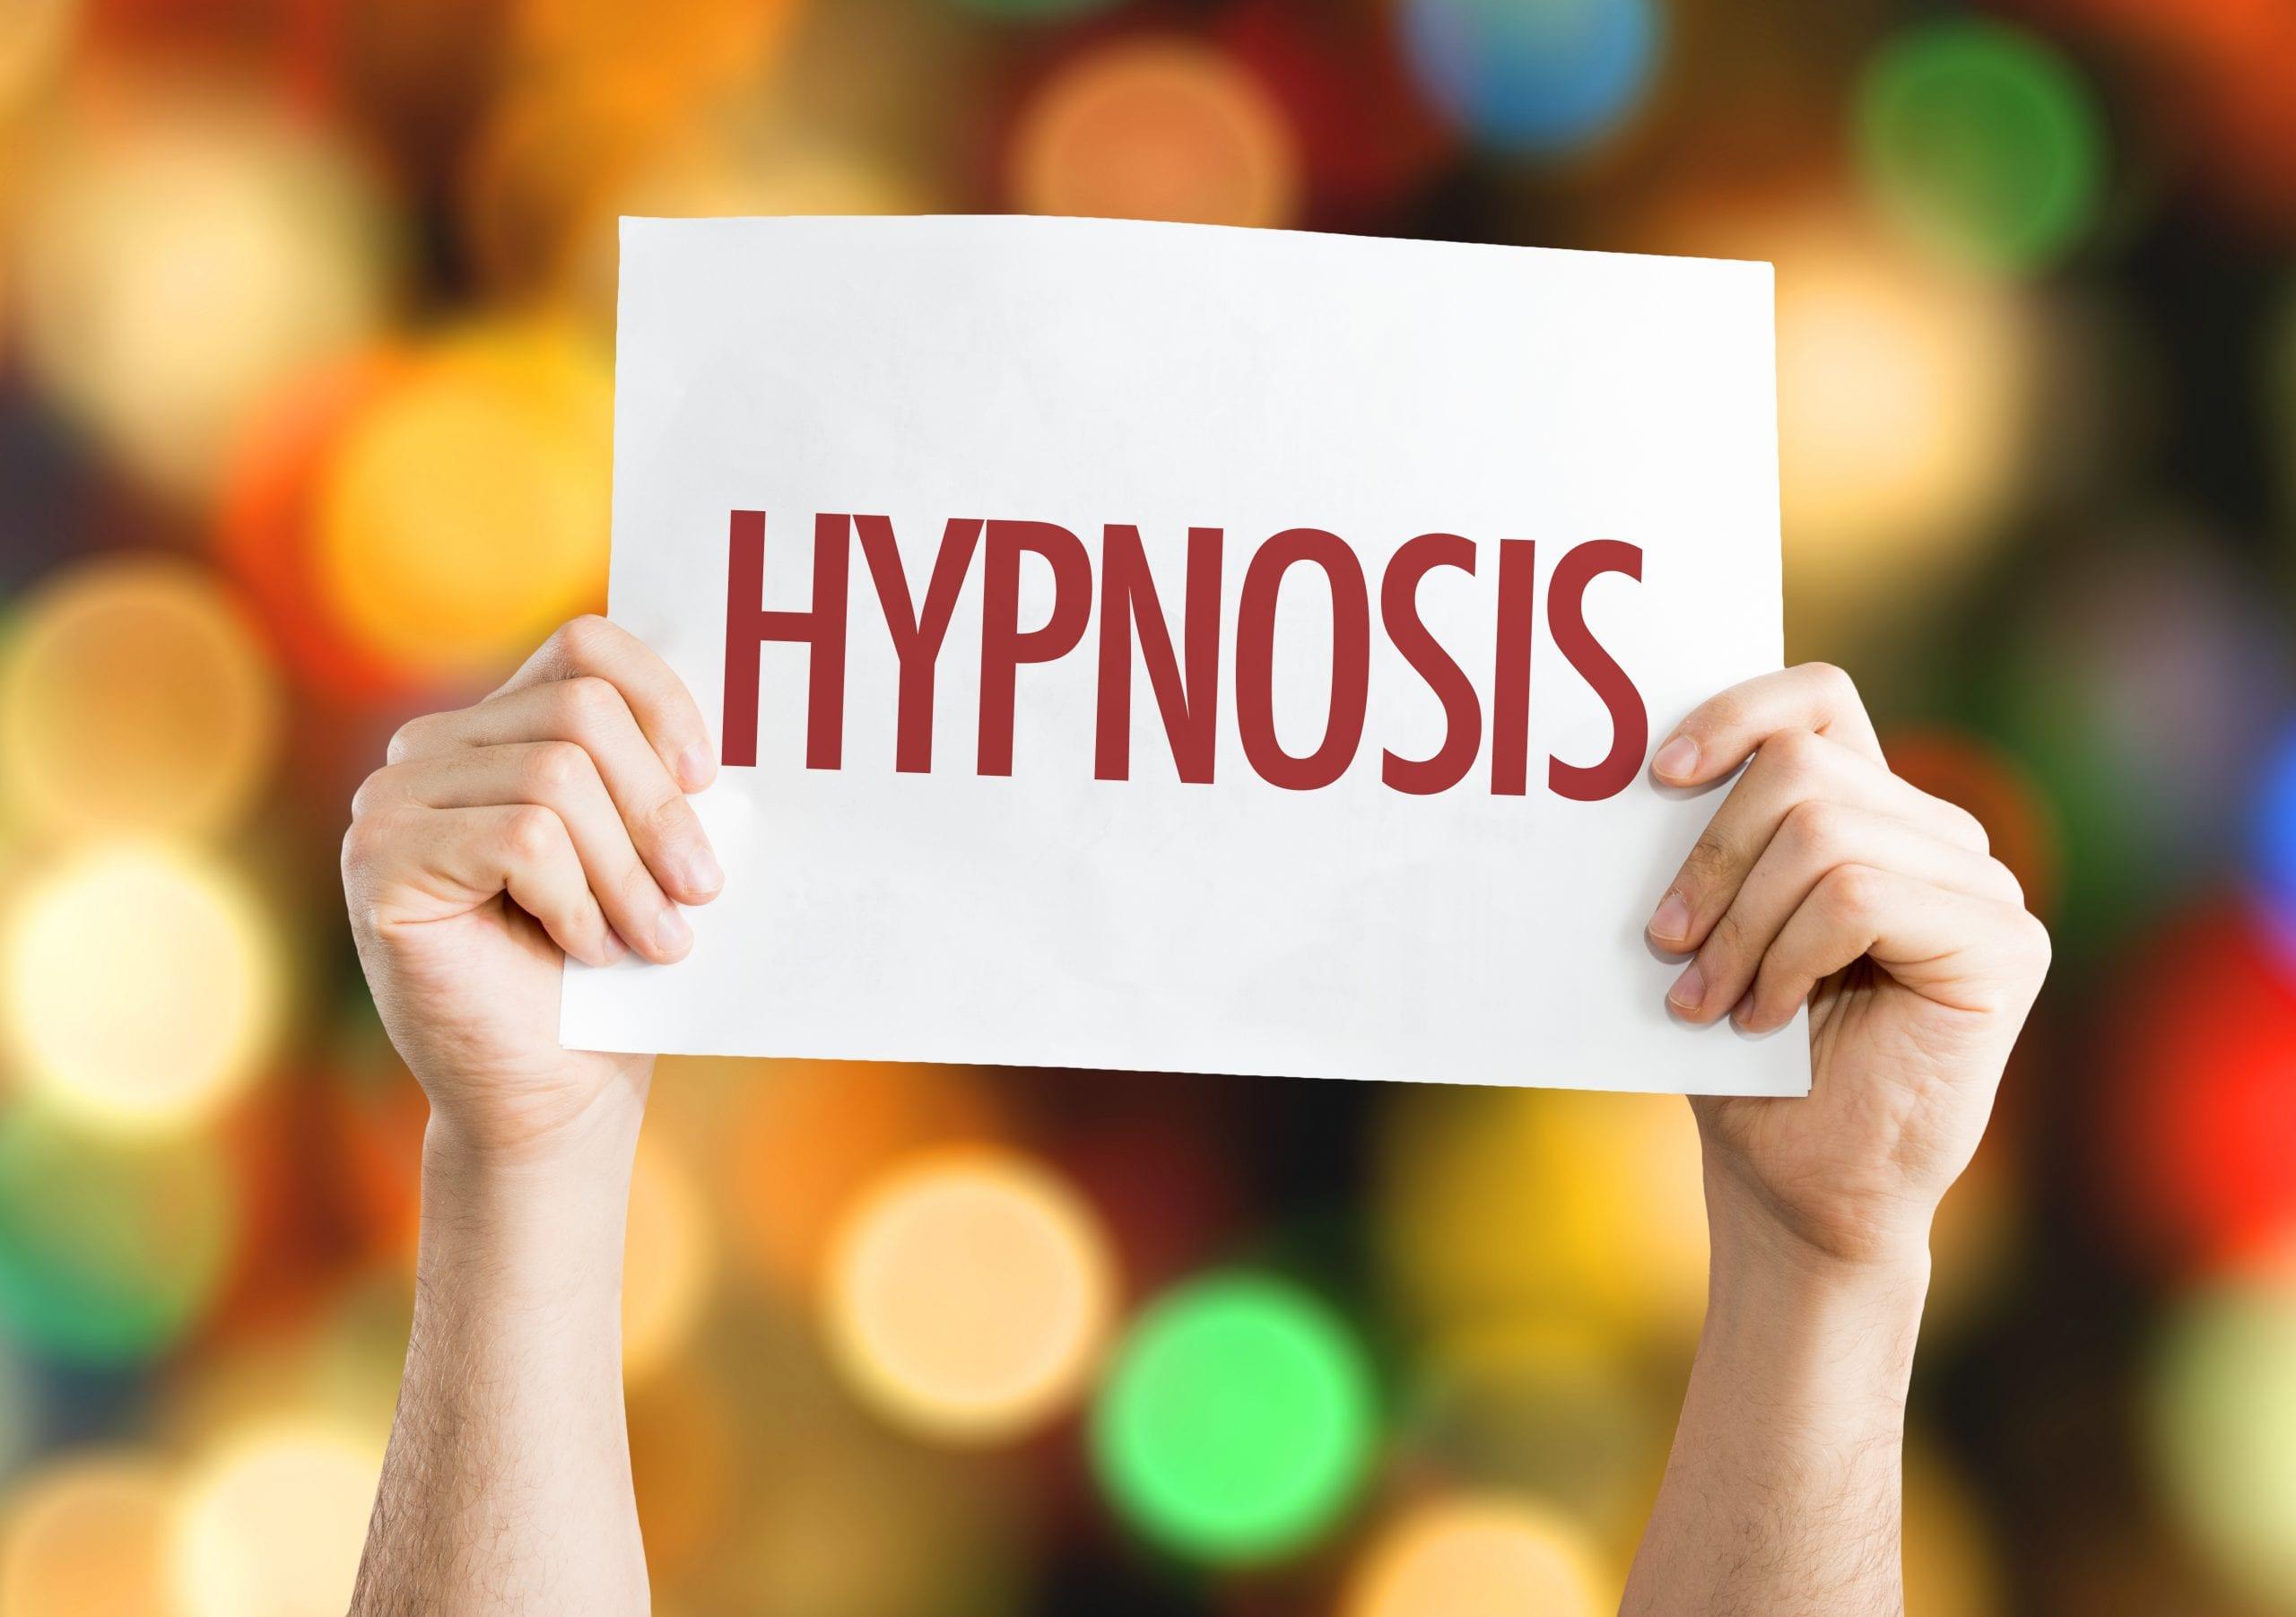 Shaff Ben Amar Hypnose - Hypnose et hypnothérapie Bourg-La-Reine Hypnose et hypnothérapie à L'Haÿ-les-Roses (94240) , Hypnose et hypnothérapie à Cachan (94230 ) , Hypnose et hypnothérapie à Arcueil (94110 ), Hypnose et hypnothérapie à Bagneux (92220 ) , Hypnose et hypnothérapie à Sceaux (92330 ), Hypnose et hypnothérapie à Fontenay-aux-Roses (92260 ), Hypnose et hypnothérapie à Chevilly-Larue (94550 ) , Hypnose et hypnothérapie s à Châtillon (92320 ), Hypnose et hypnothérapie à Fresnes (94260 ), Hypnose et hypnothérapie au Plessis-Robinson (92350 ) , Hypnose et hypnothérapie à Montrouge (92120 ) , Hypnose et hypnothérapie à Antony (92160 ), Hypnose et hypnothérapie à Gentilly (94250 ), Hypnose et hypnothérapie à Malakoff (92240 ), Hypnose et hypnothérapie à Villejuif (94800 ) , Hypnose et hypnothérapie à Clamart (92140 ), Hypnose et hypnothérapie à Châtenay-Malabry (92290 ), Hypnose et hypnothérapie à Rungis (94150 ) , Hypnose et hypnothérapie au Kremlin-Bicêtre (94270), Hypnose et hypnothérapie à Paris (75), Hypnose et hypnothérapie en Île de France , Hypnose et hypnothérapie à Paris (75000) , Hypnose et hypnothérapie à Boulogne-Billancourt (92100) , Hypnose et hypnothérapie à Saint-Denis (93200) , Hypnose et hypnothérapie à Argenteuil (95100) , Hypnose et hypnothérapie à Montreuil (93100) , Hypnose et hypnothérapie à Créteil (94000) , Hypnose et hypnothérapie à Nanterre (92000) , Hypnose et hypnothérapie à Courbevoie (92400) , Hypnose et hypnothérapie à Versailles (78000) , Hypnose et hypnothérapie à Vitry-sur-Seine (94400) , Hypnose et hypnothérapie à Colombes (92700) , Hypnose et hypnothérapie à Asnières-sur-Seine (92600) , Hypnose et hypnothérapie à Aulnay-sous-Bois (93600) , Hypnose et hypnothérapie à Rueil-Malmaison (92500) , Hypnose et hypnothérapie à Aubervilliers (93300) , Hypnose et hypnothérapie à Champigny-sur-Marne (94500) , Hypnose et hypnothérapie à Saint-Maur-des-Fossés (94100) , Hypnose et hypnothérapie à Drancy (93700) , Hypnose et hypnothérapie à